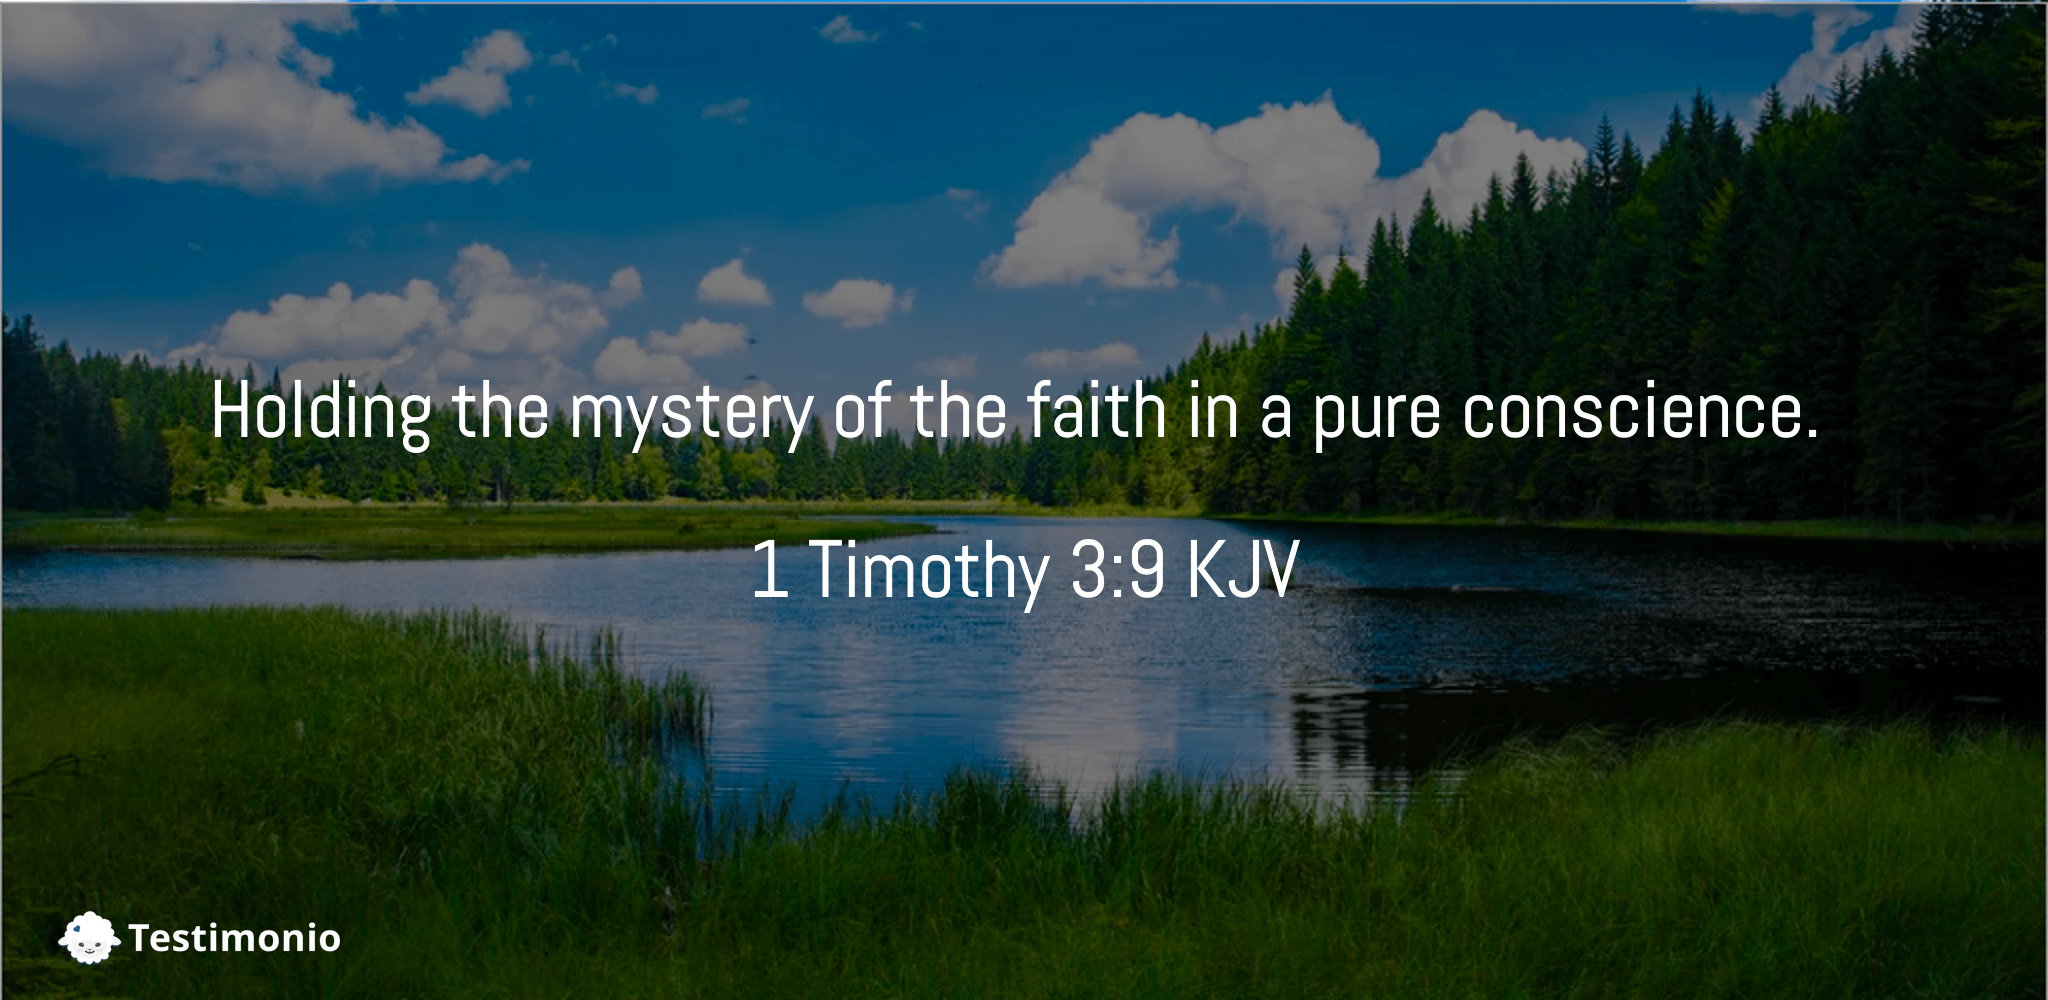 1 Timothy 3:9